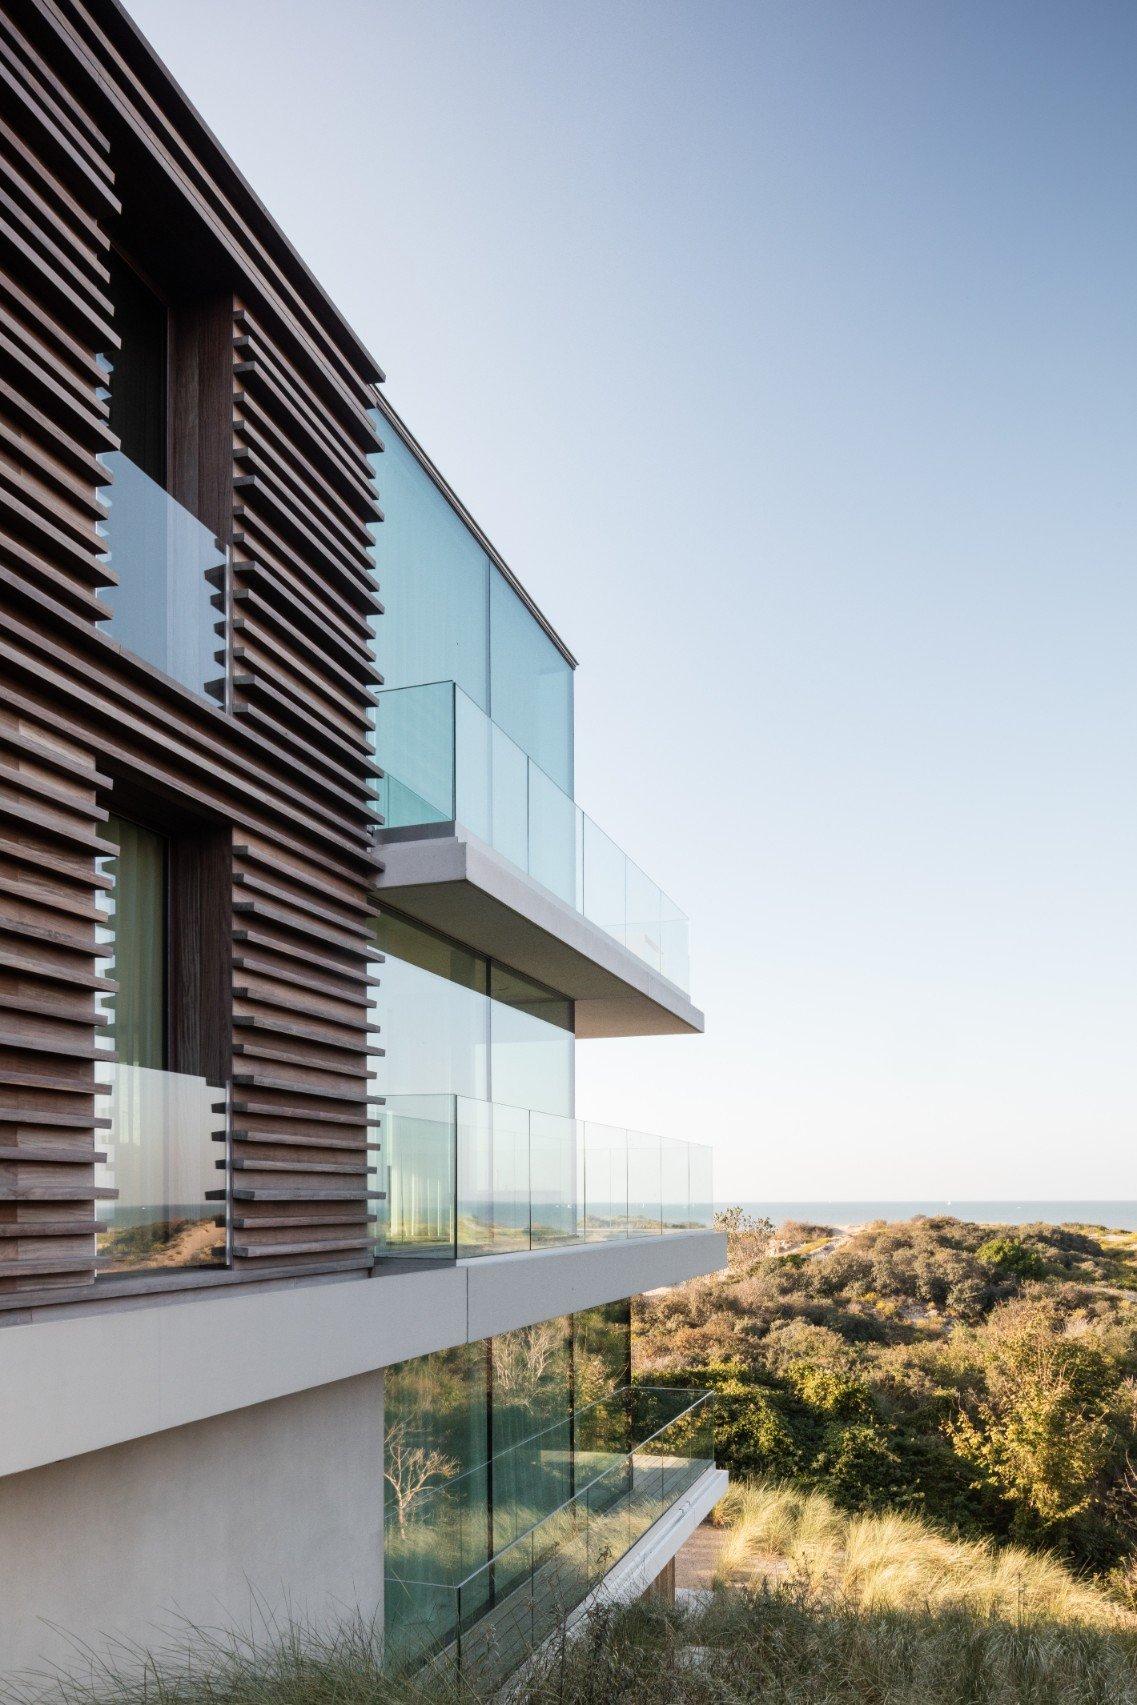 Rietveldprojects-Residence-ON-appartement-design-architectuur-kust-tvdv14.jpg